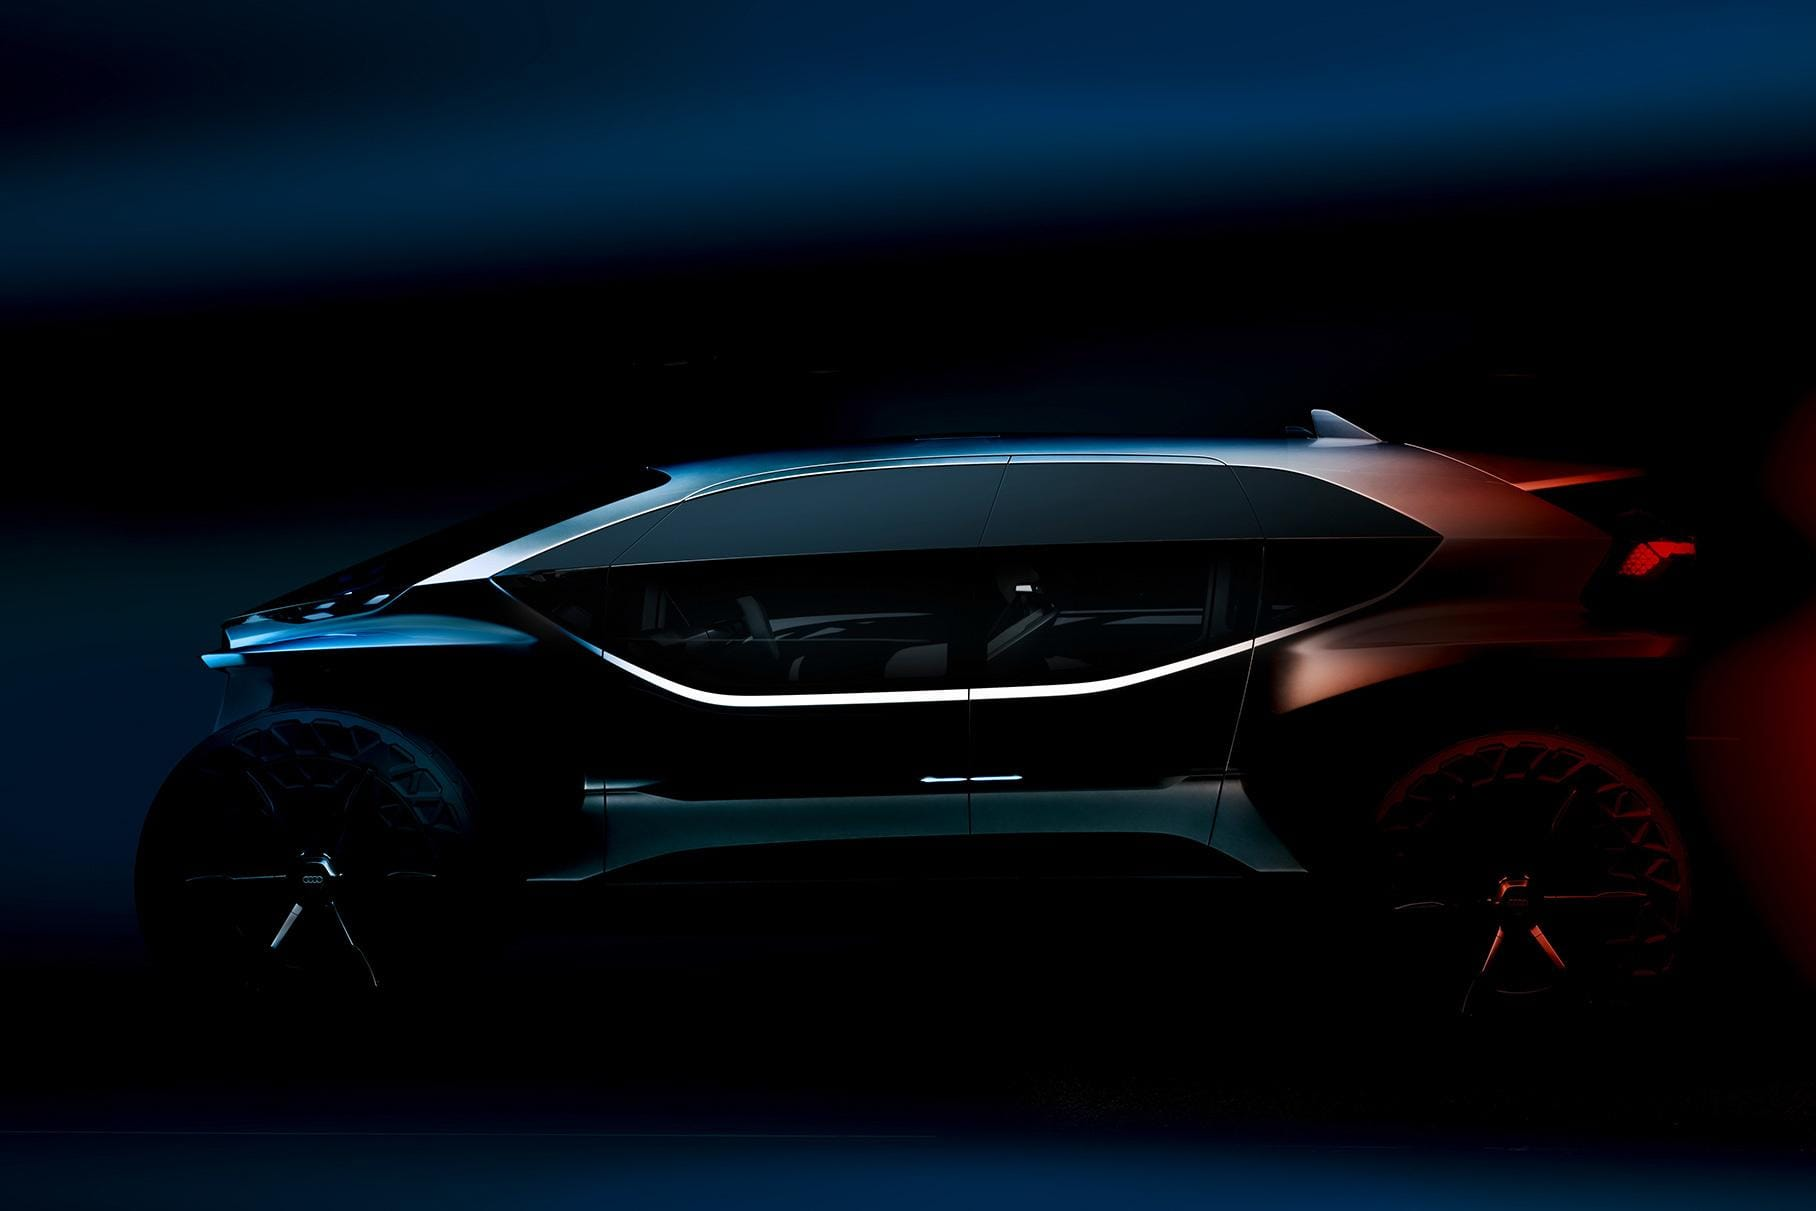 На Франкфуртском автосалоне Audi представит футуристичный электрический кроссовер